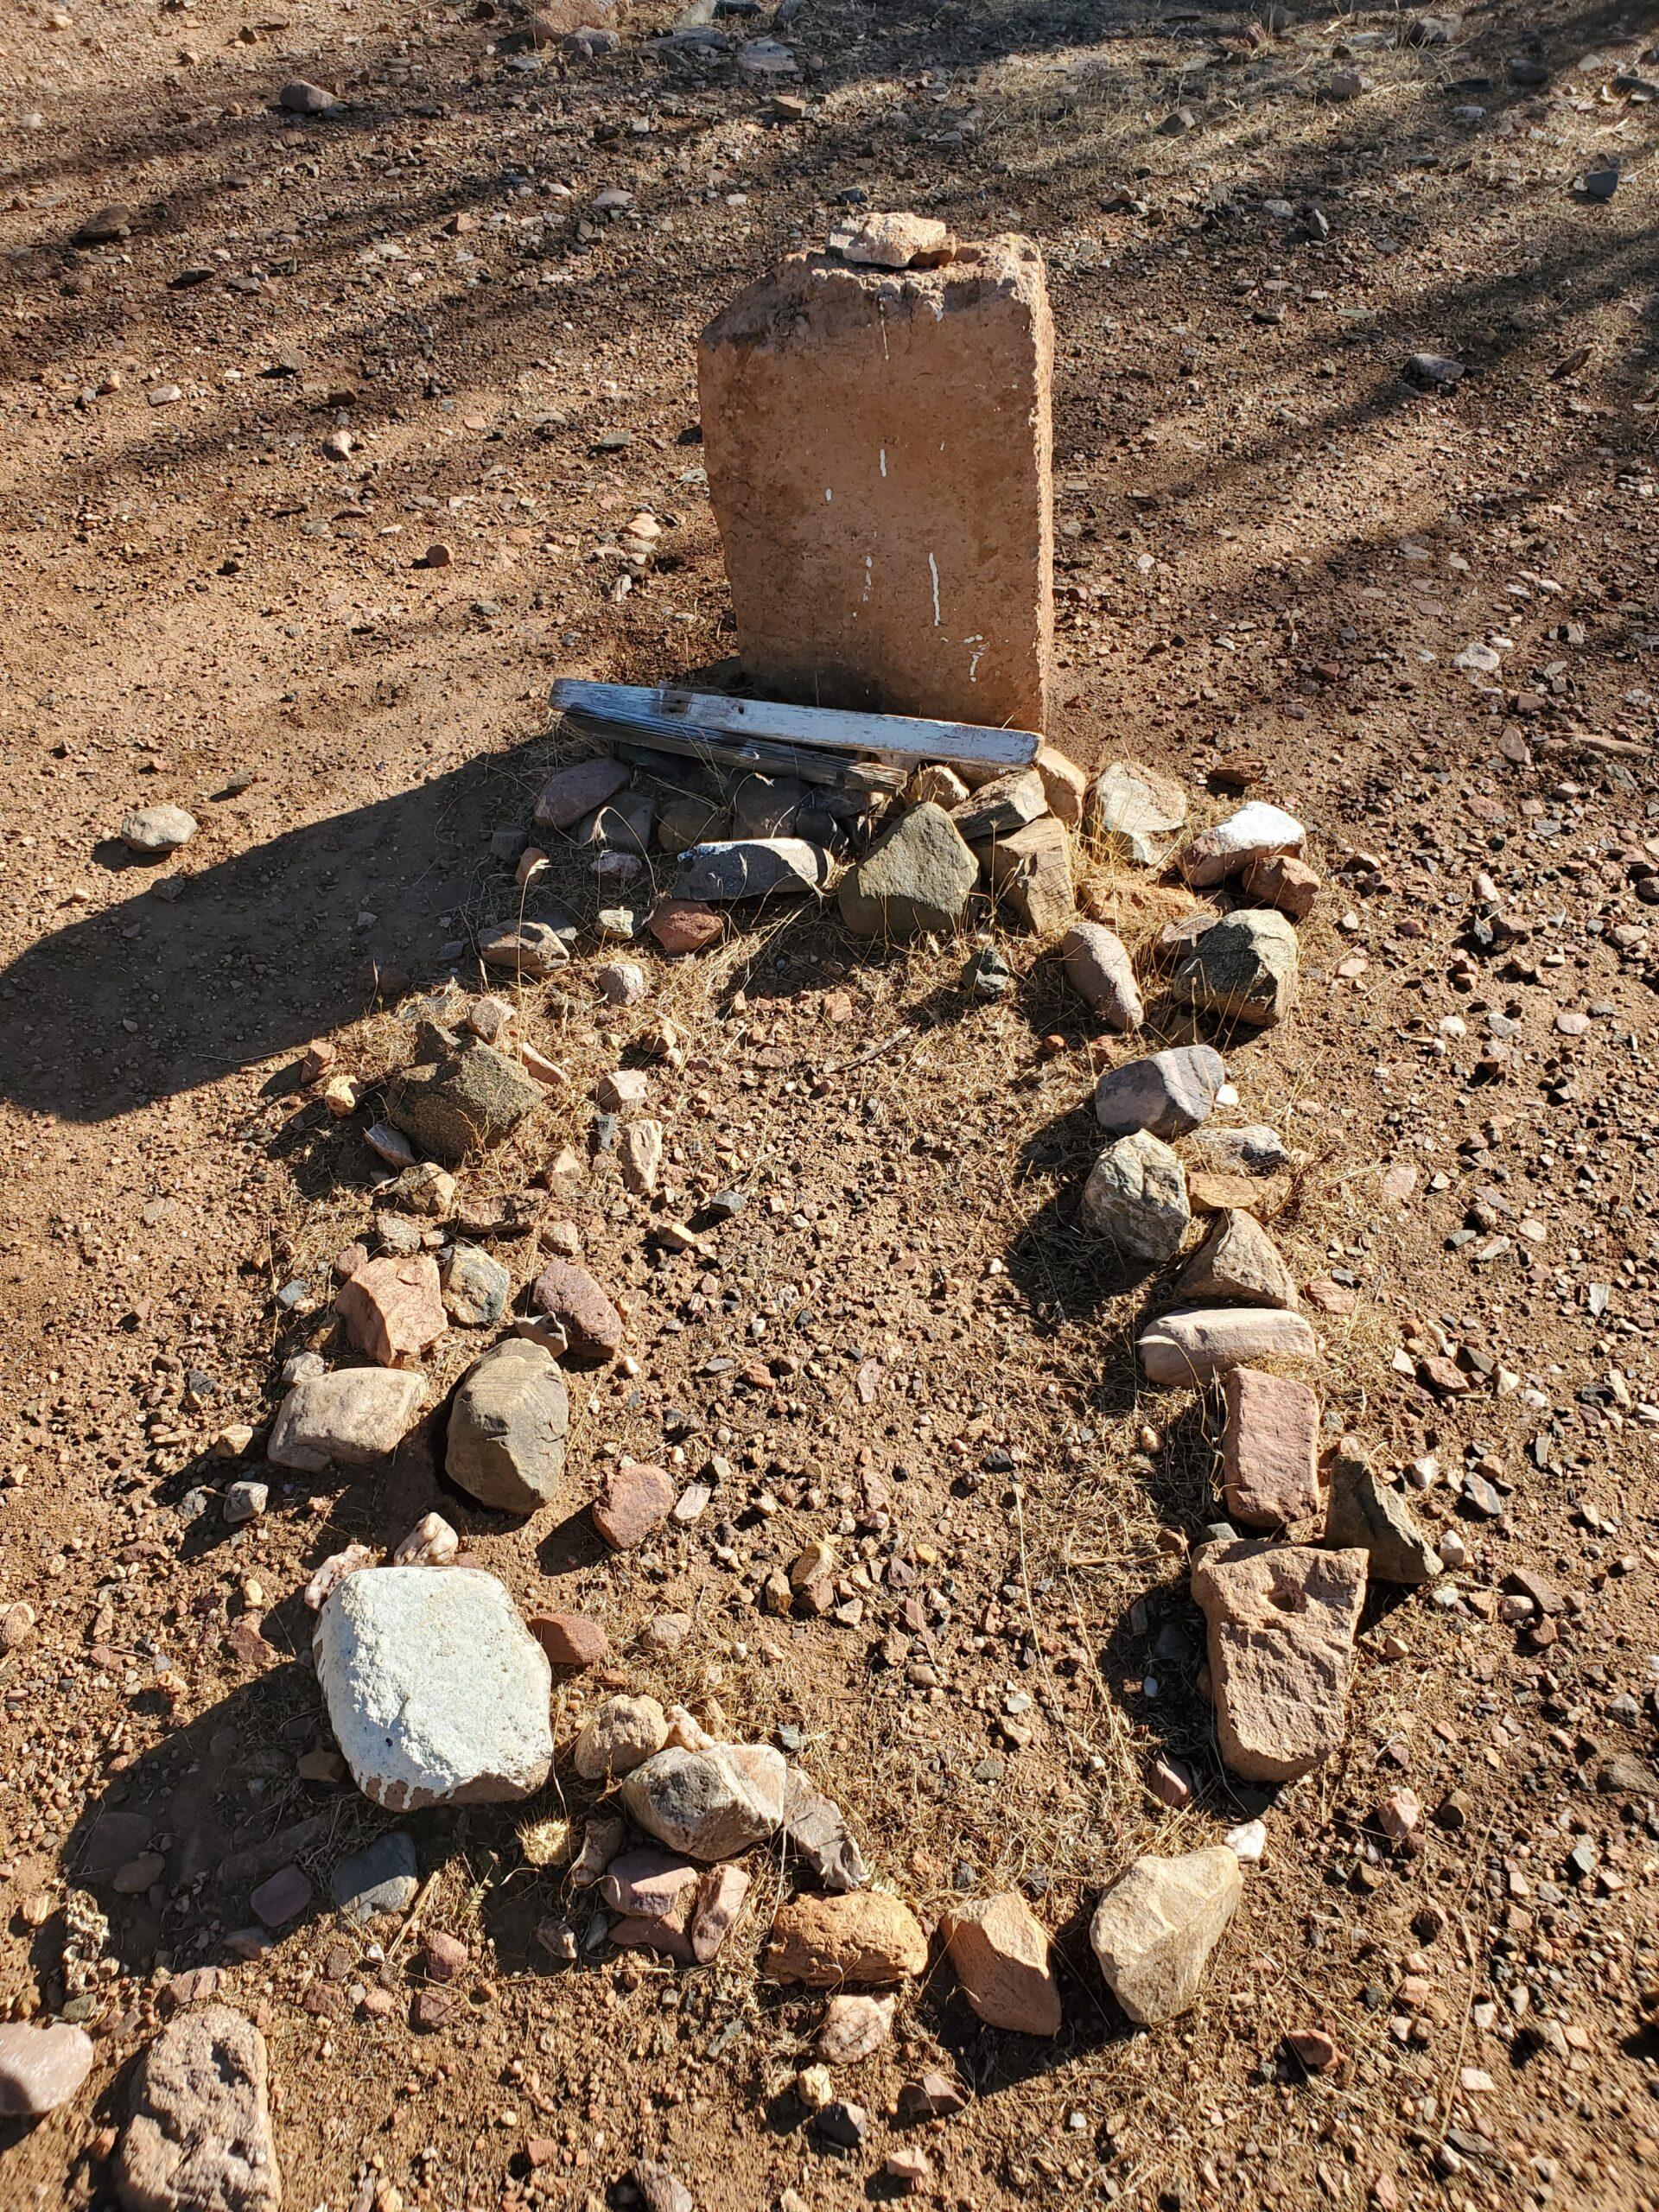 A marked grave at Historic Pinal